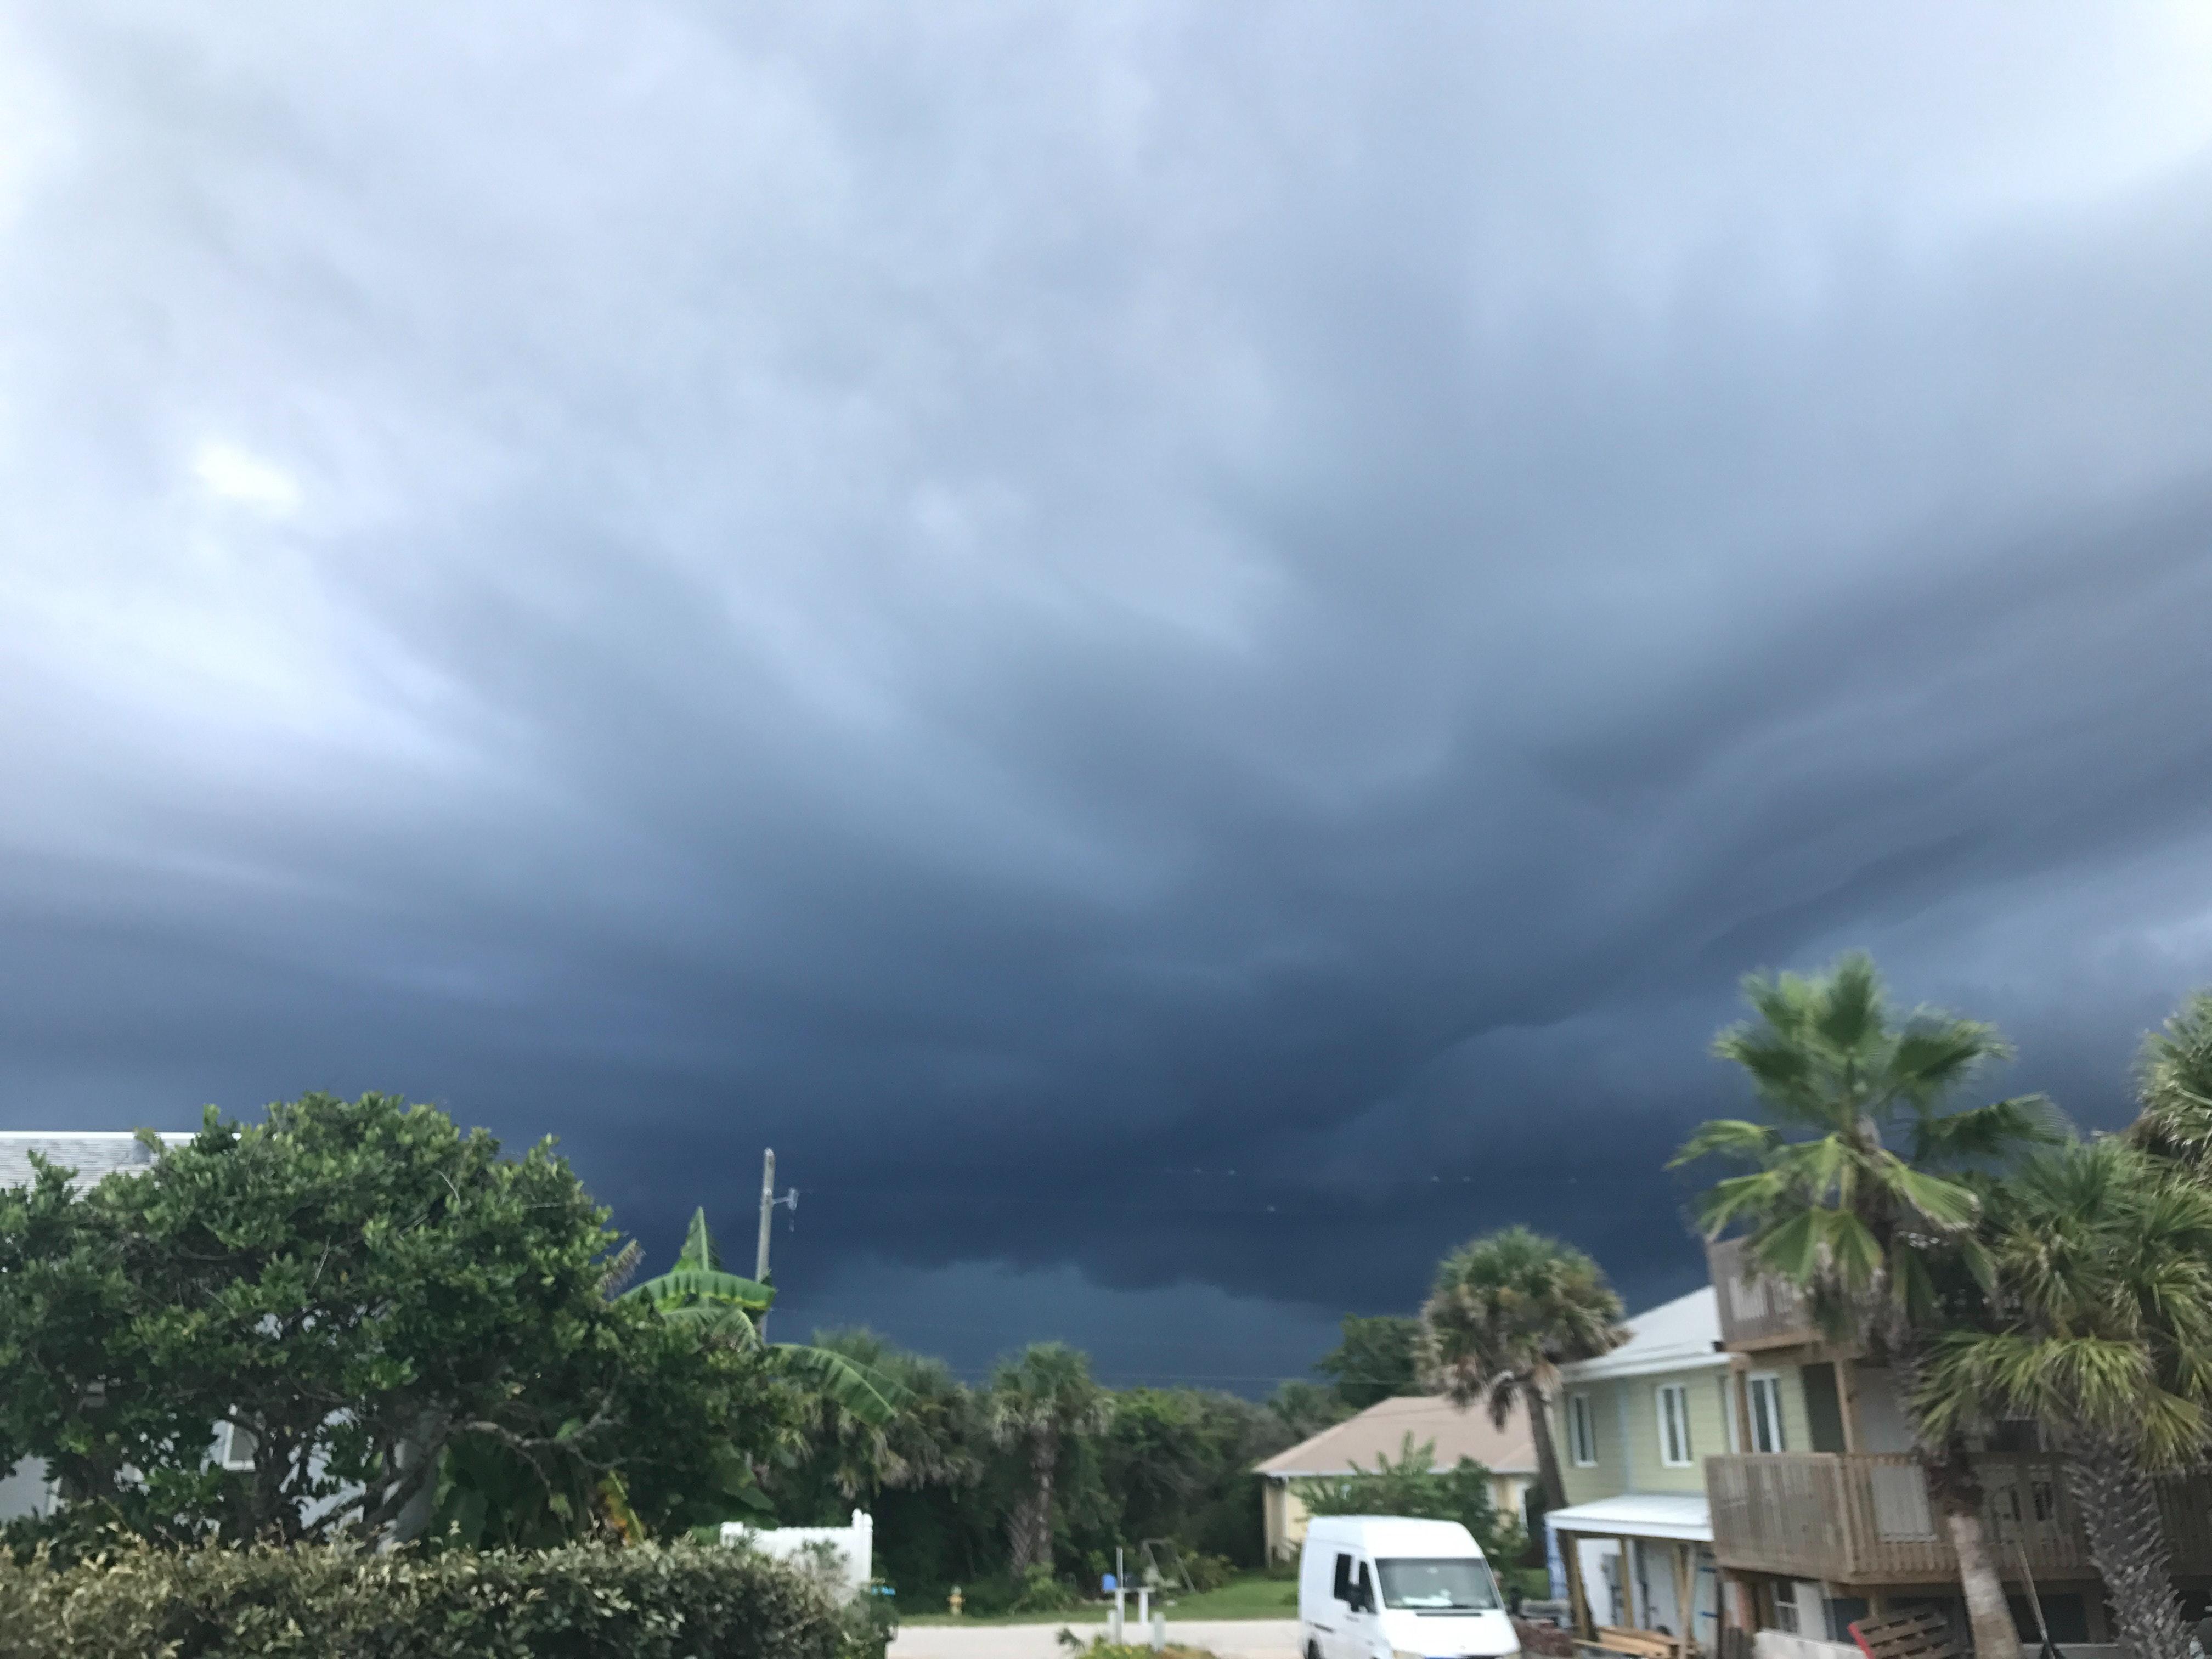 Free stock photo of grey sky rain hurricane irma calm before storm